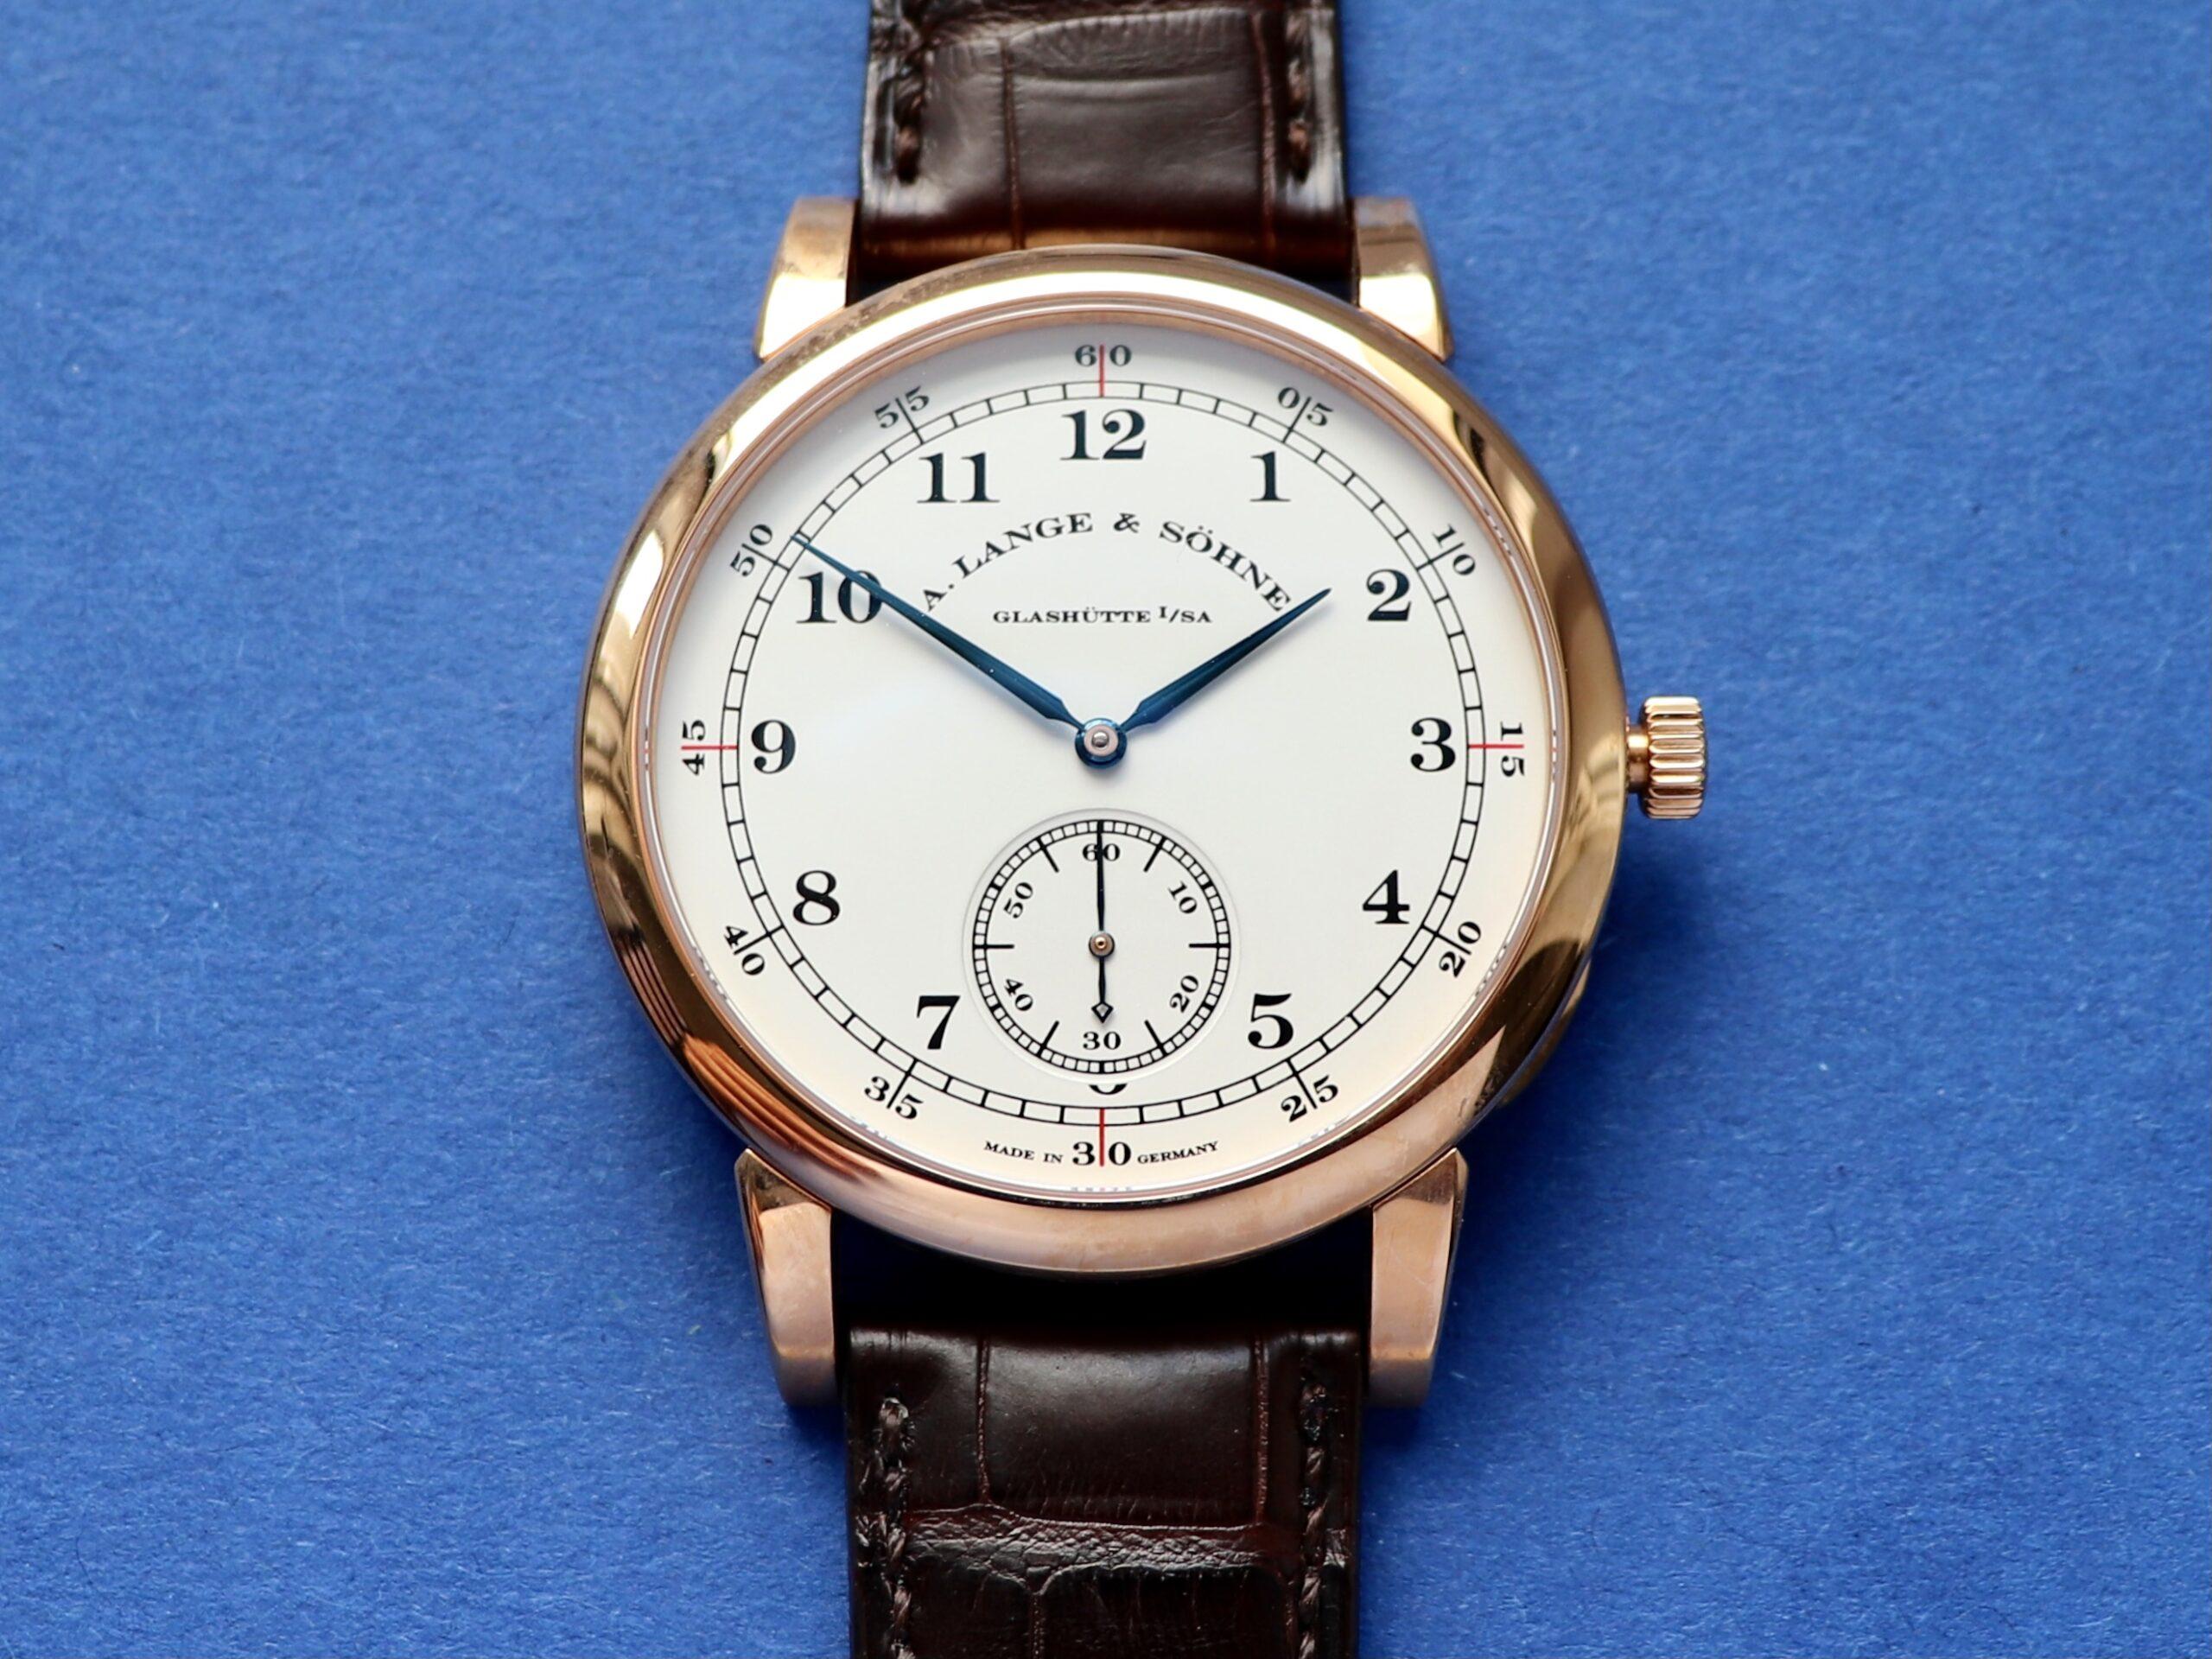 a lange sohne 1815 cuvette oeding erdel special edition pink gold 323.047 dial